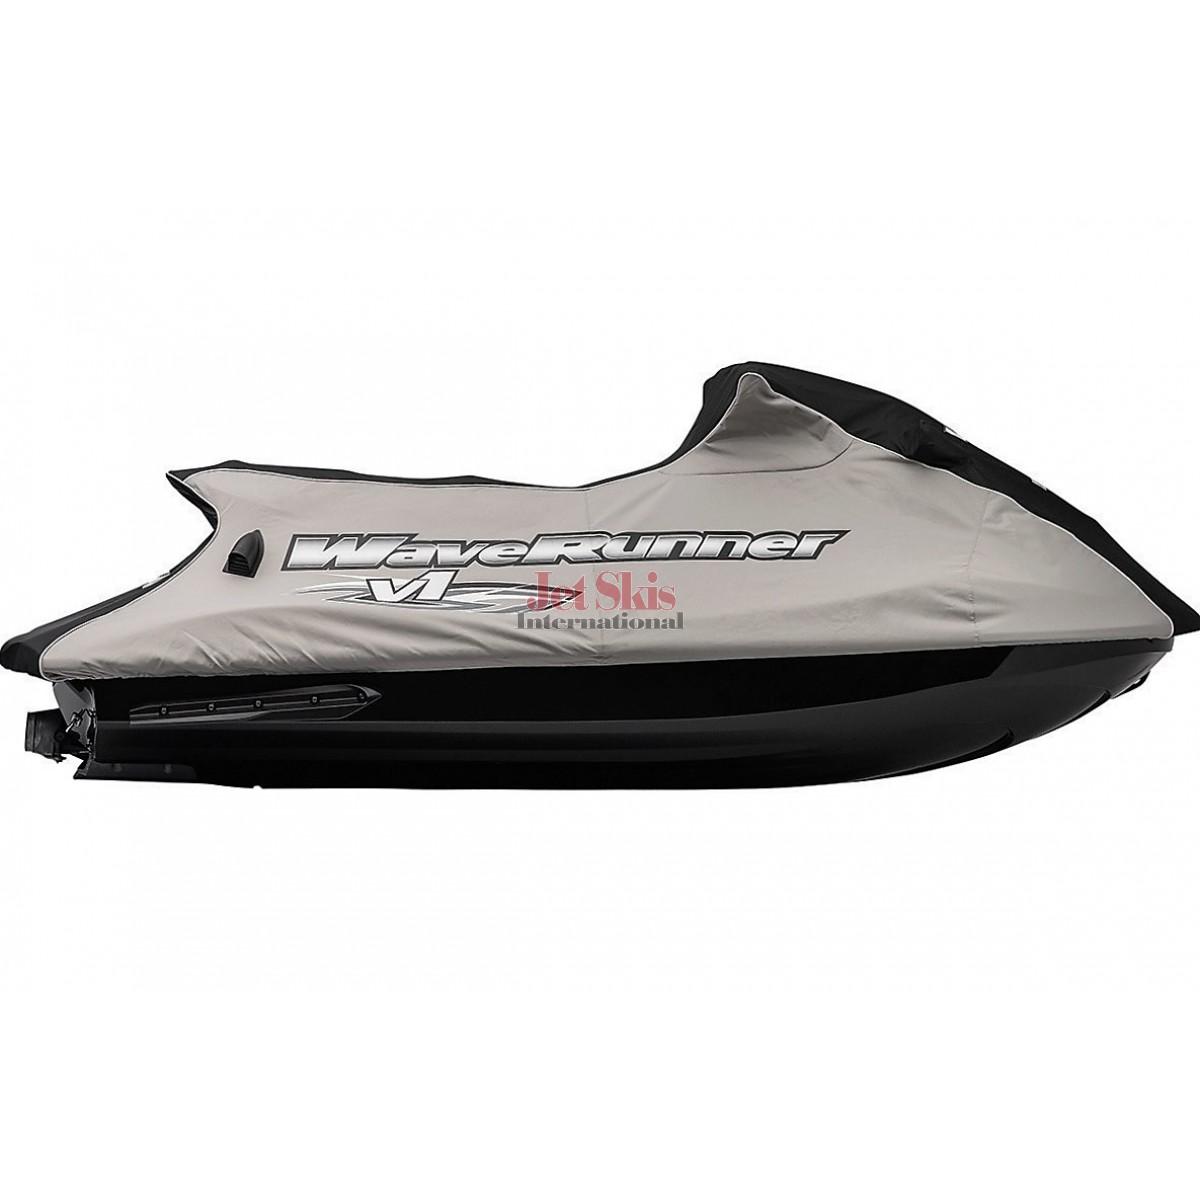 Yamaha Waverunner V1 Sport Storage Mooring Cover Mwv Cvrv1 Ch 15 Fuel Filter And Trailer